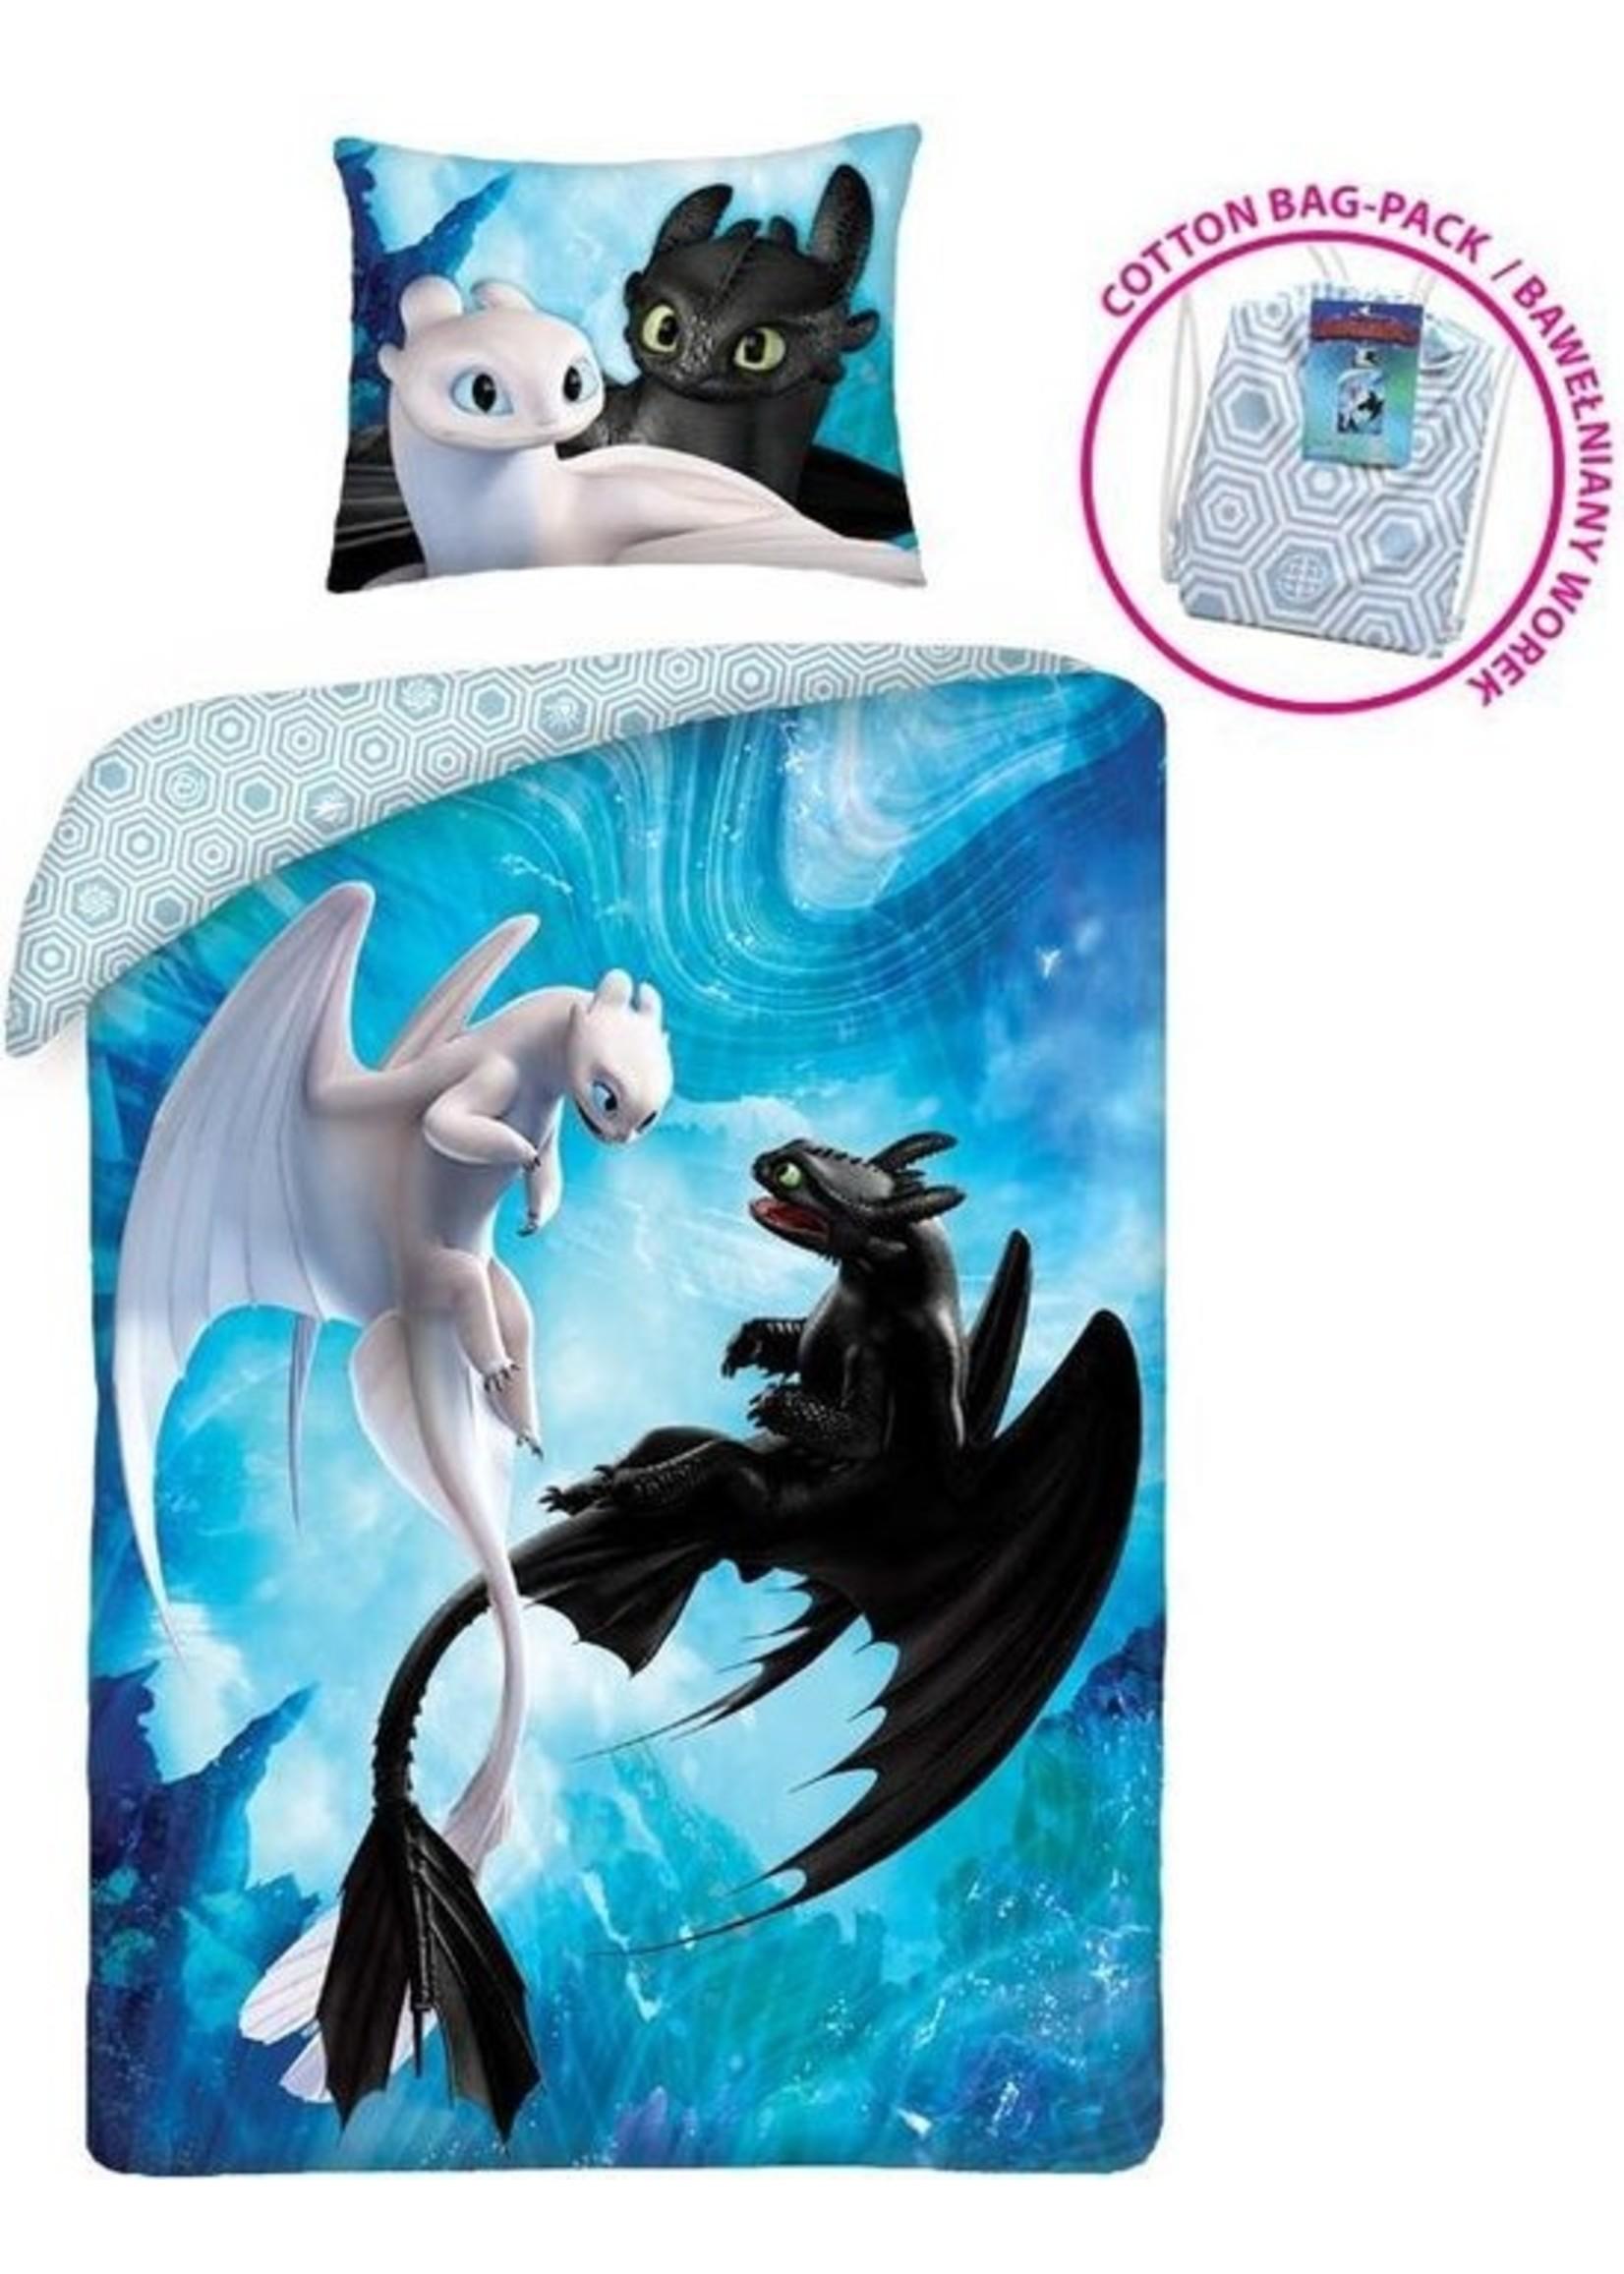 Dreamworks How to Train your Dragon Dekbedovertrek Toothless & Fury